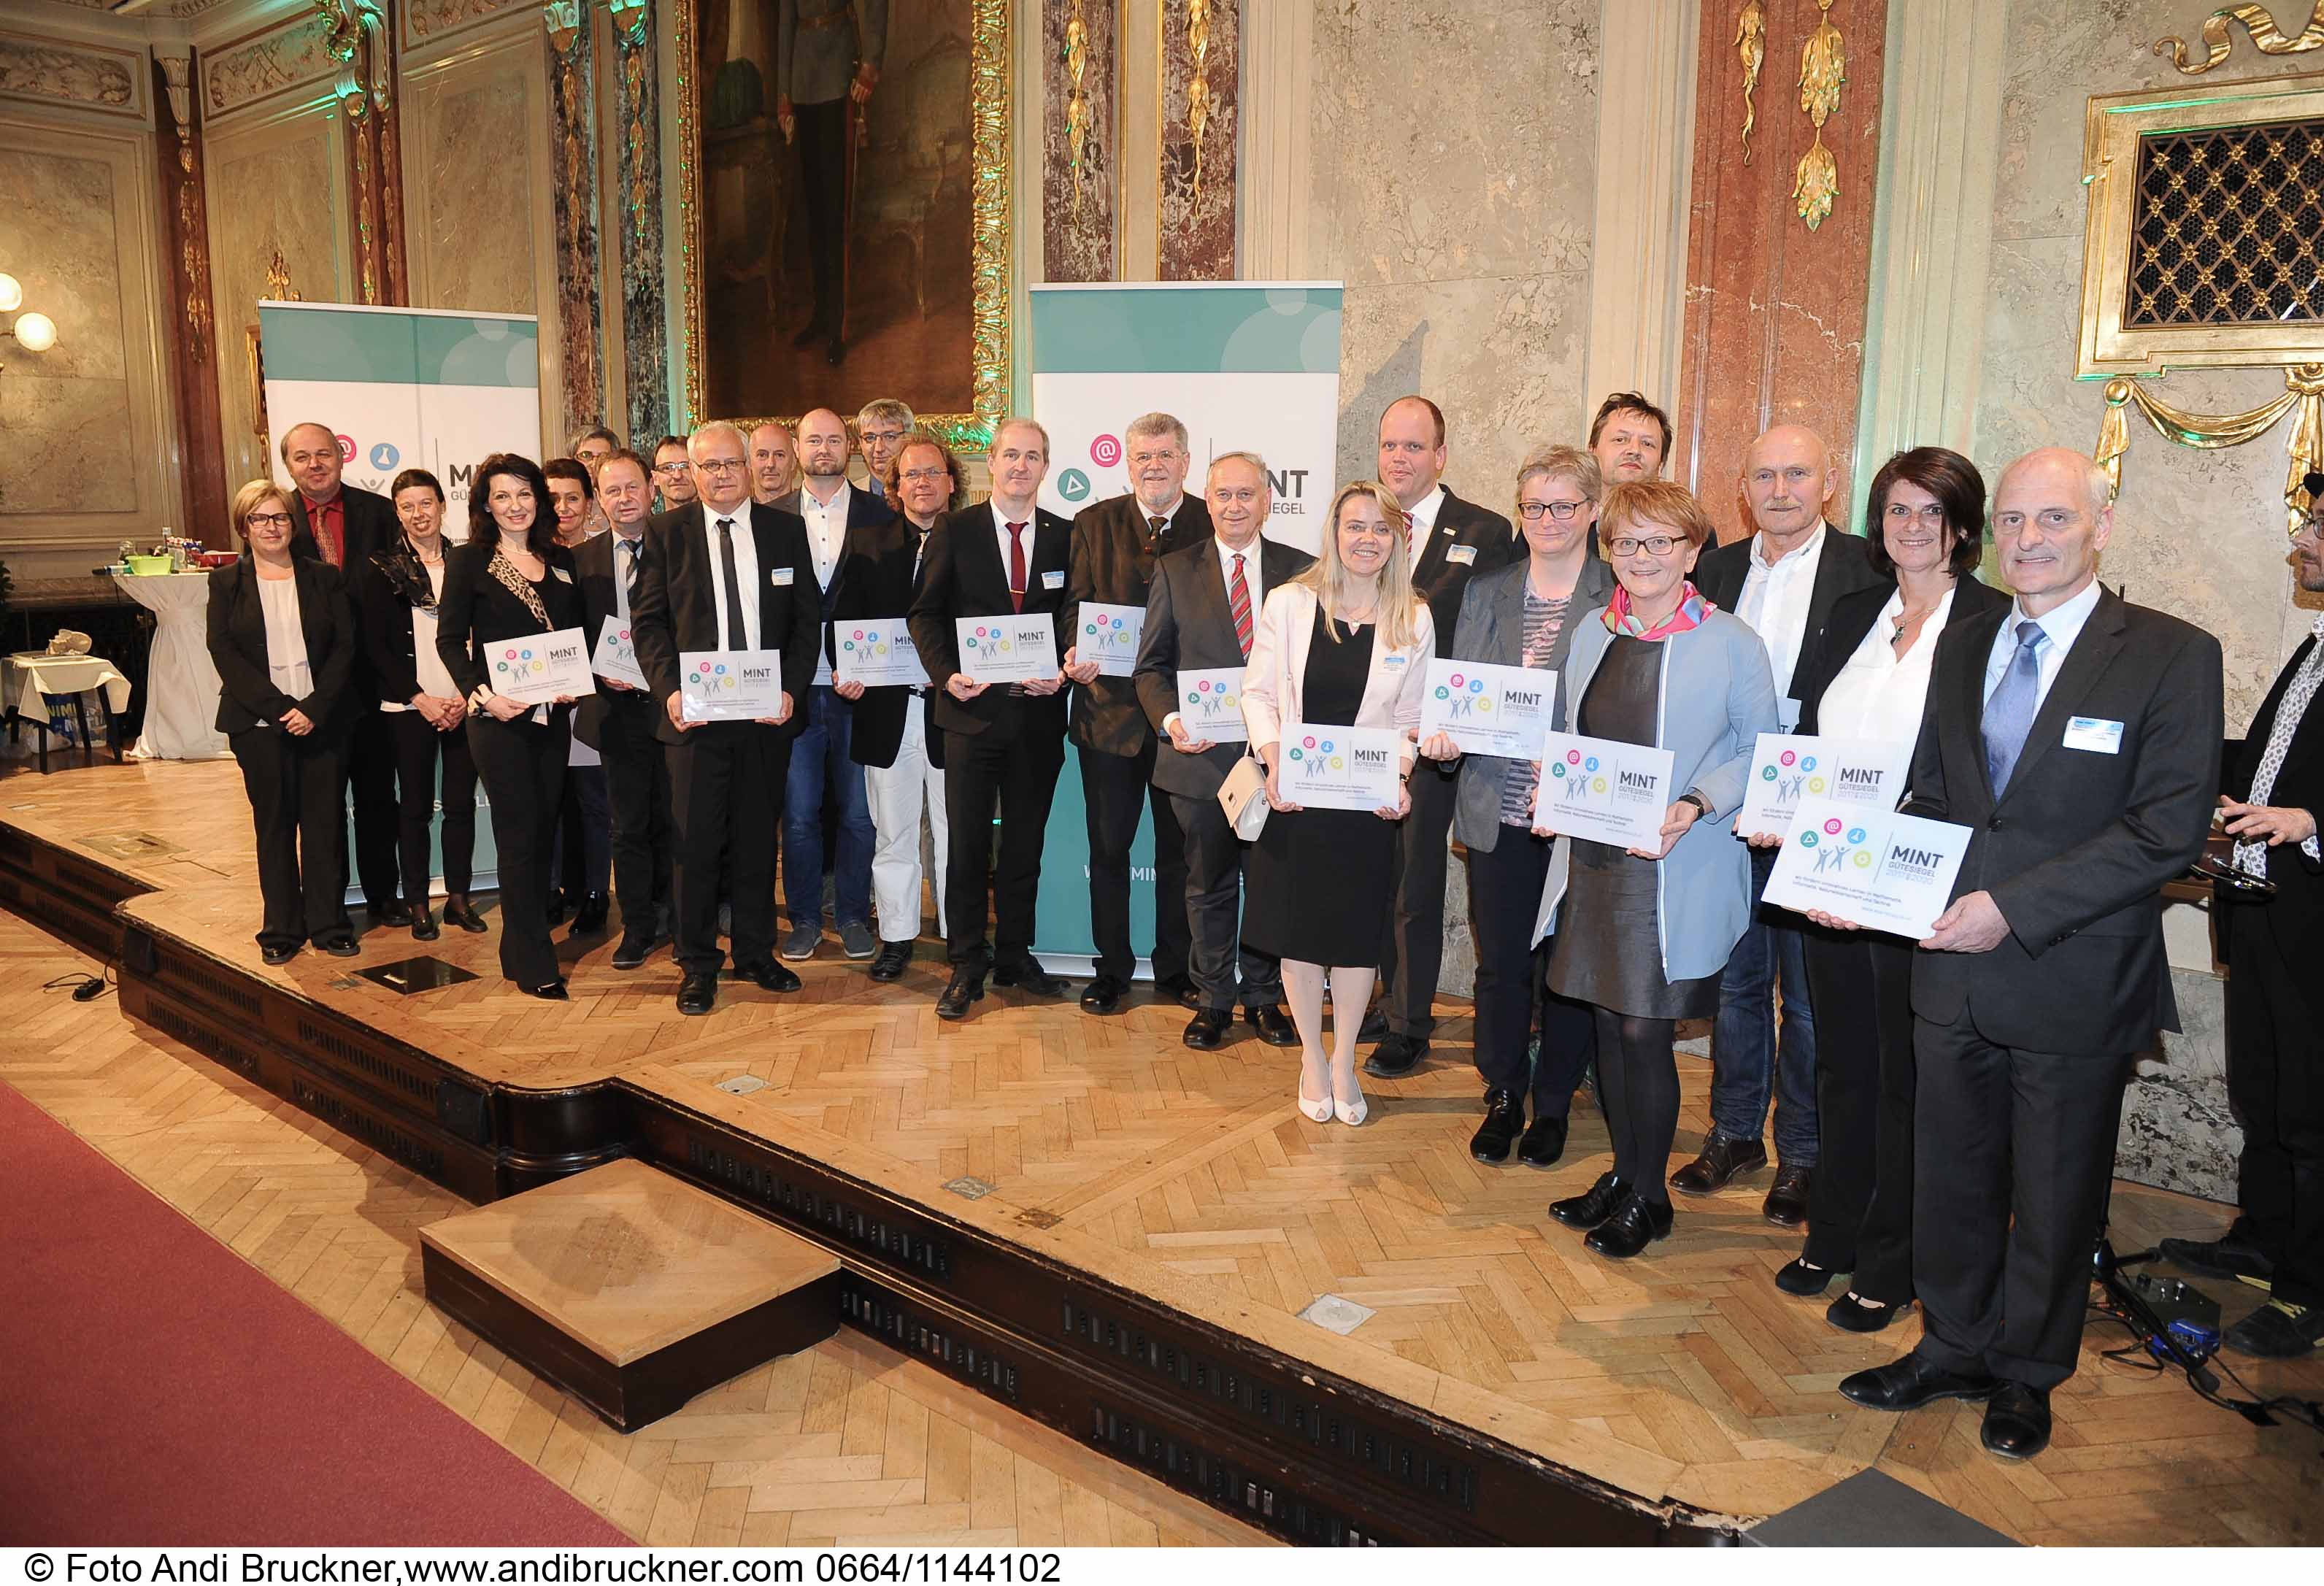 Hertha Firnbergschulen mit dem MINT-Gütesiegel ausgezeichnet